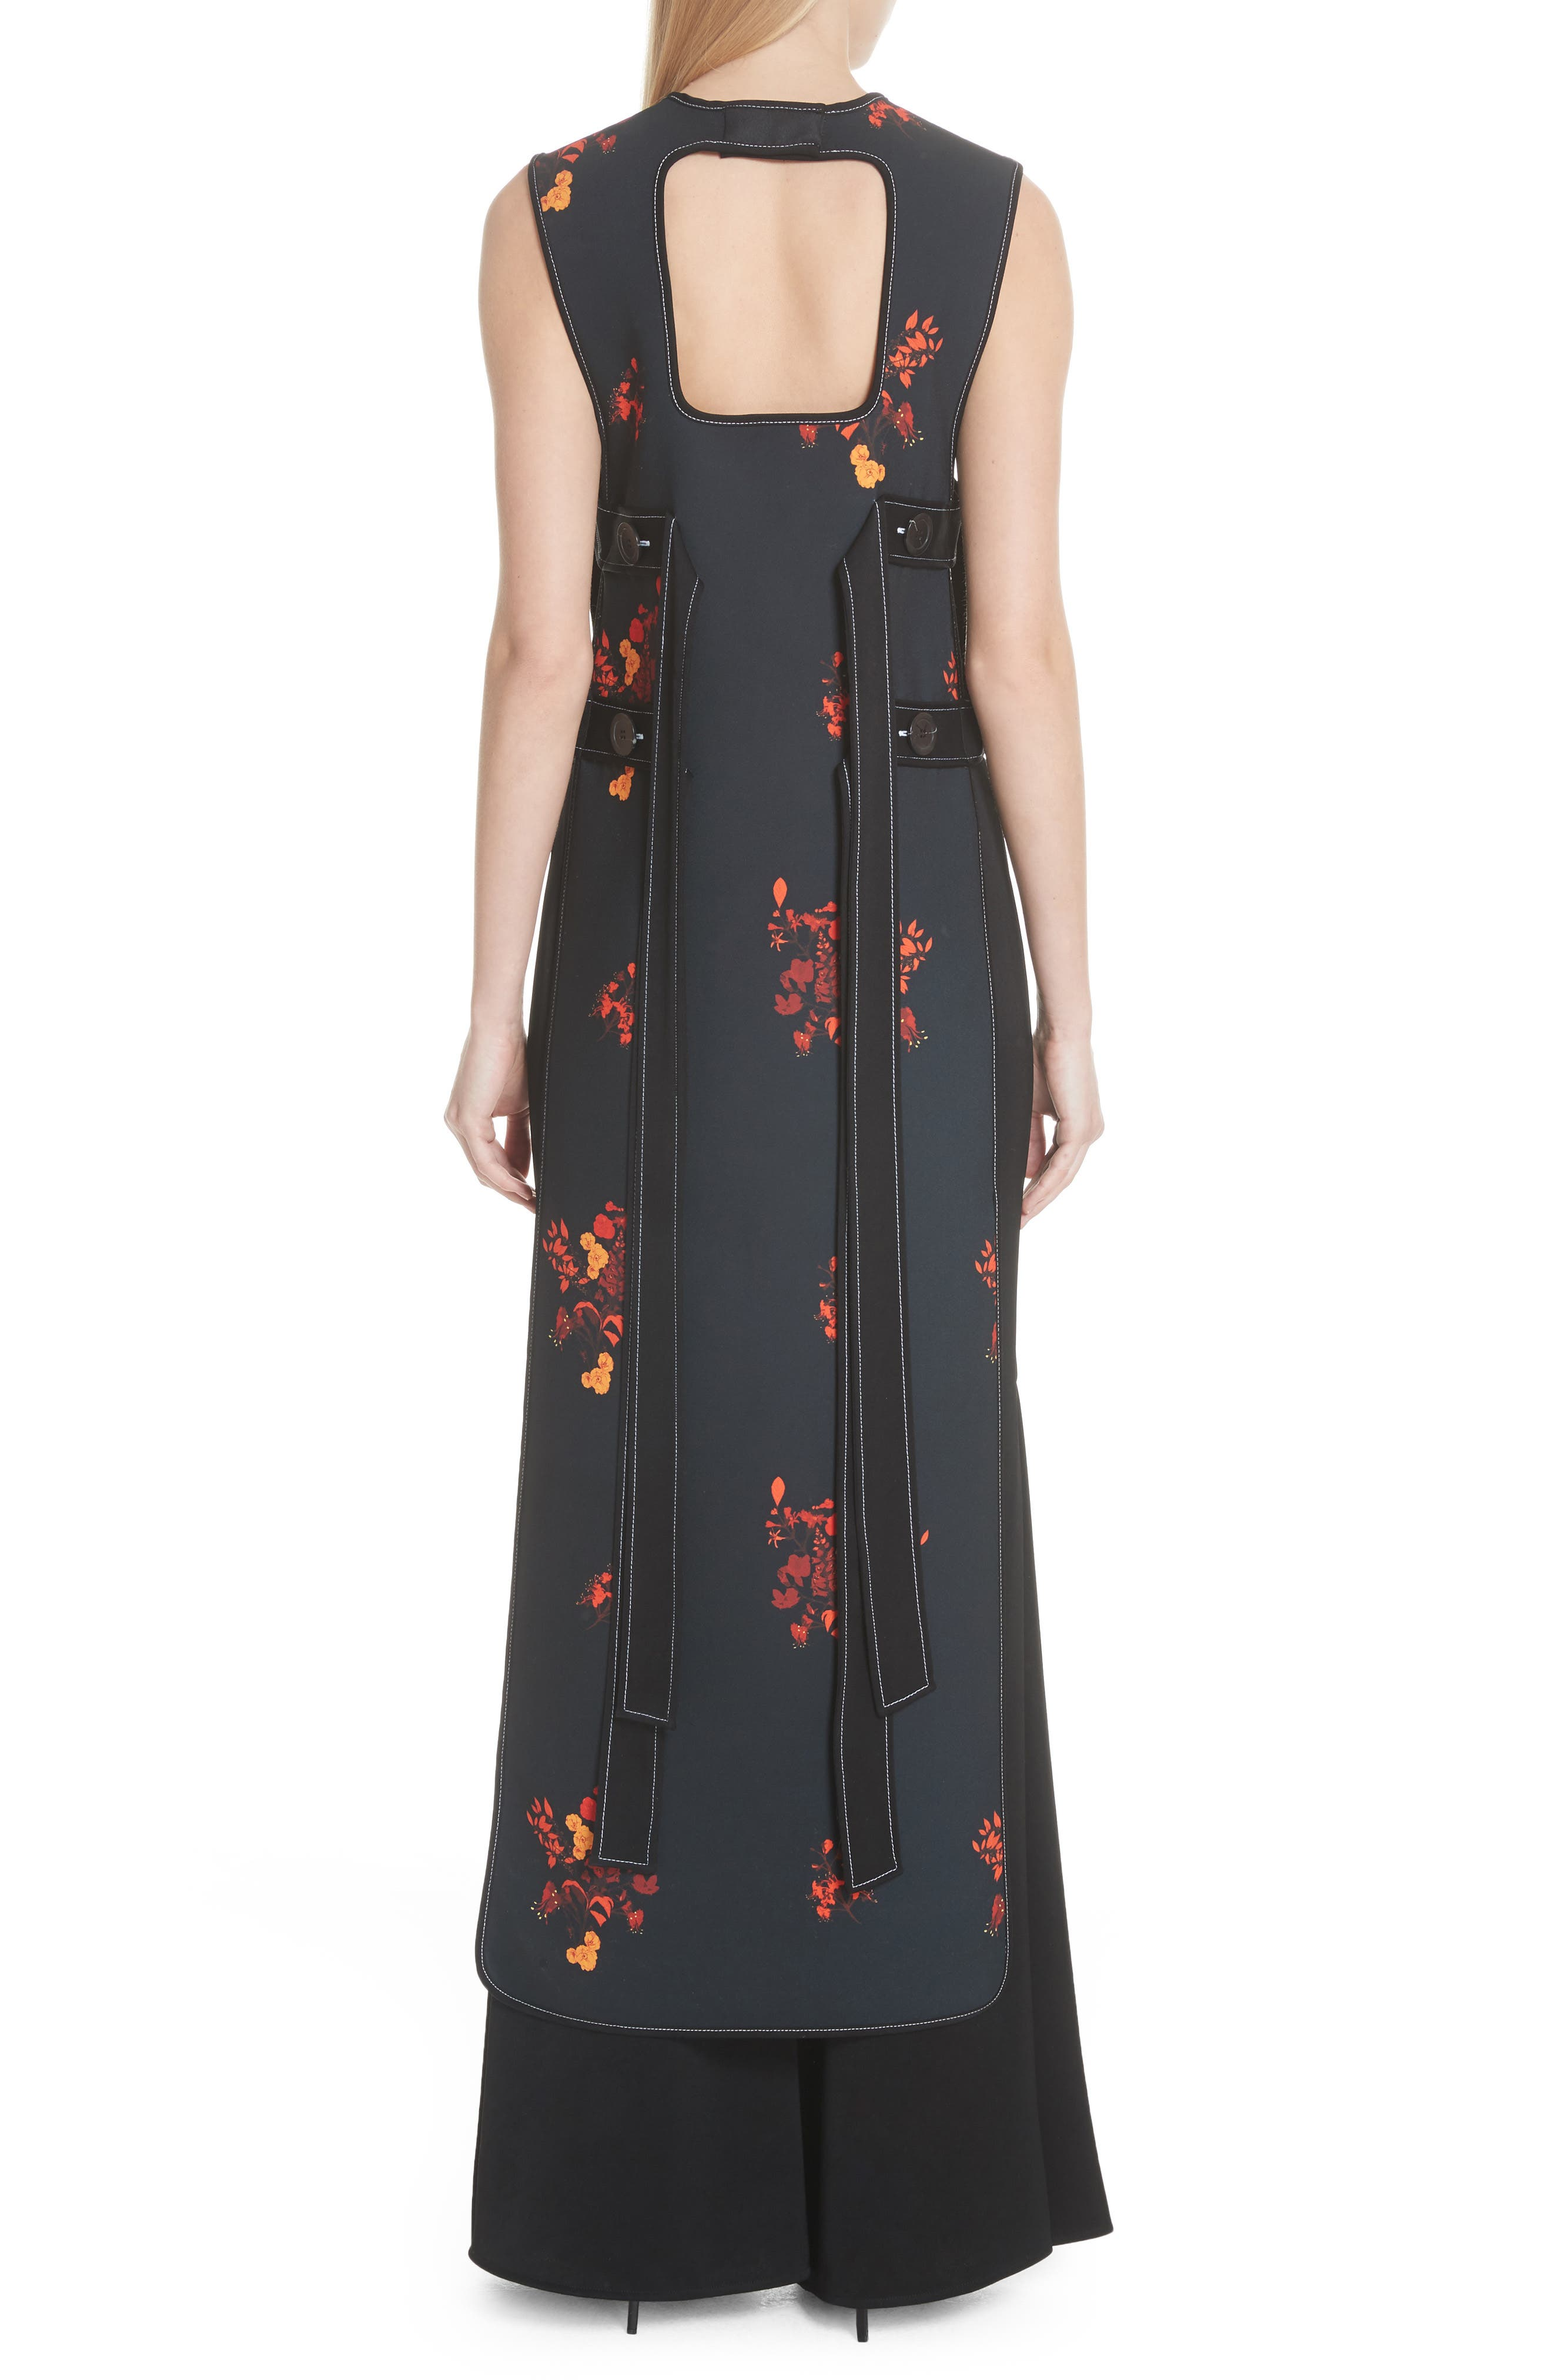 Judy Sleeveless Crepe Tunic Dress,                             Alternate thumbnail 2, color,                             800